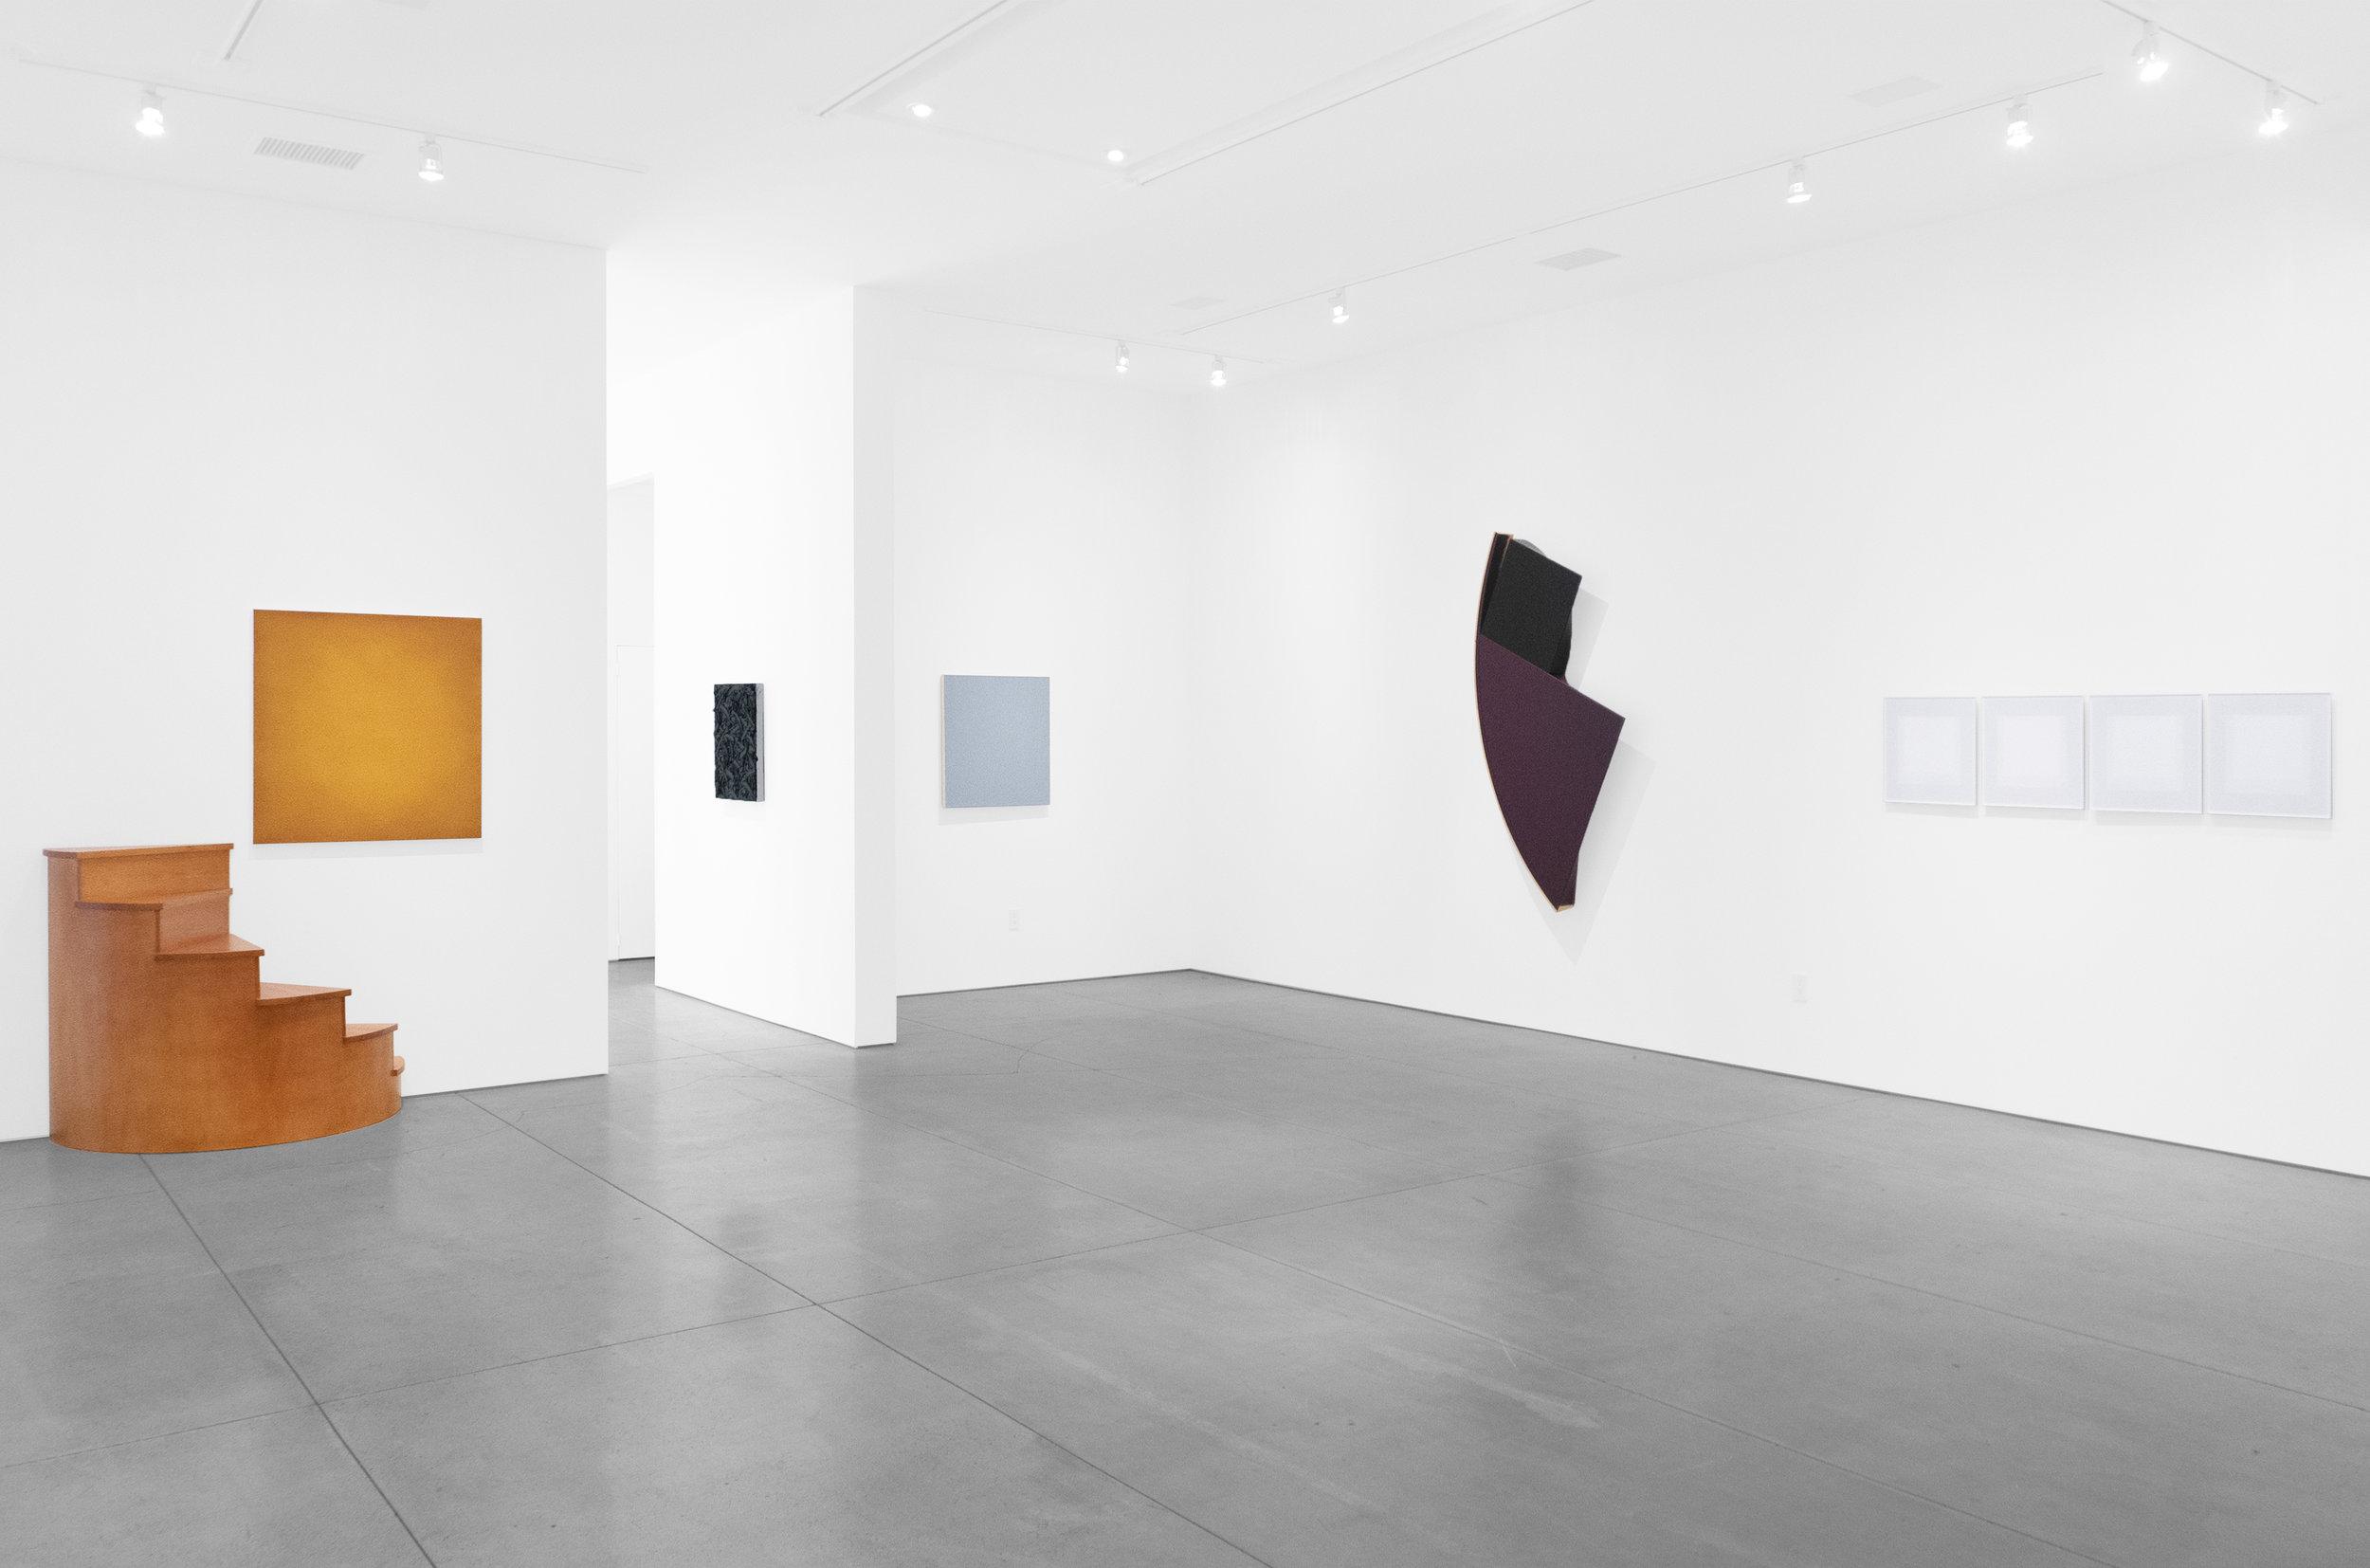 25 Years_Peter Blake Gallery_2019_Installation View_18.jpg